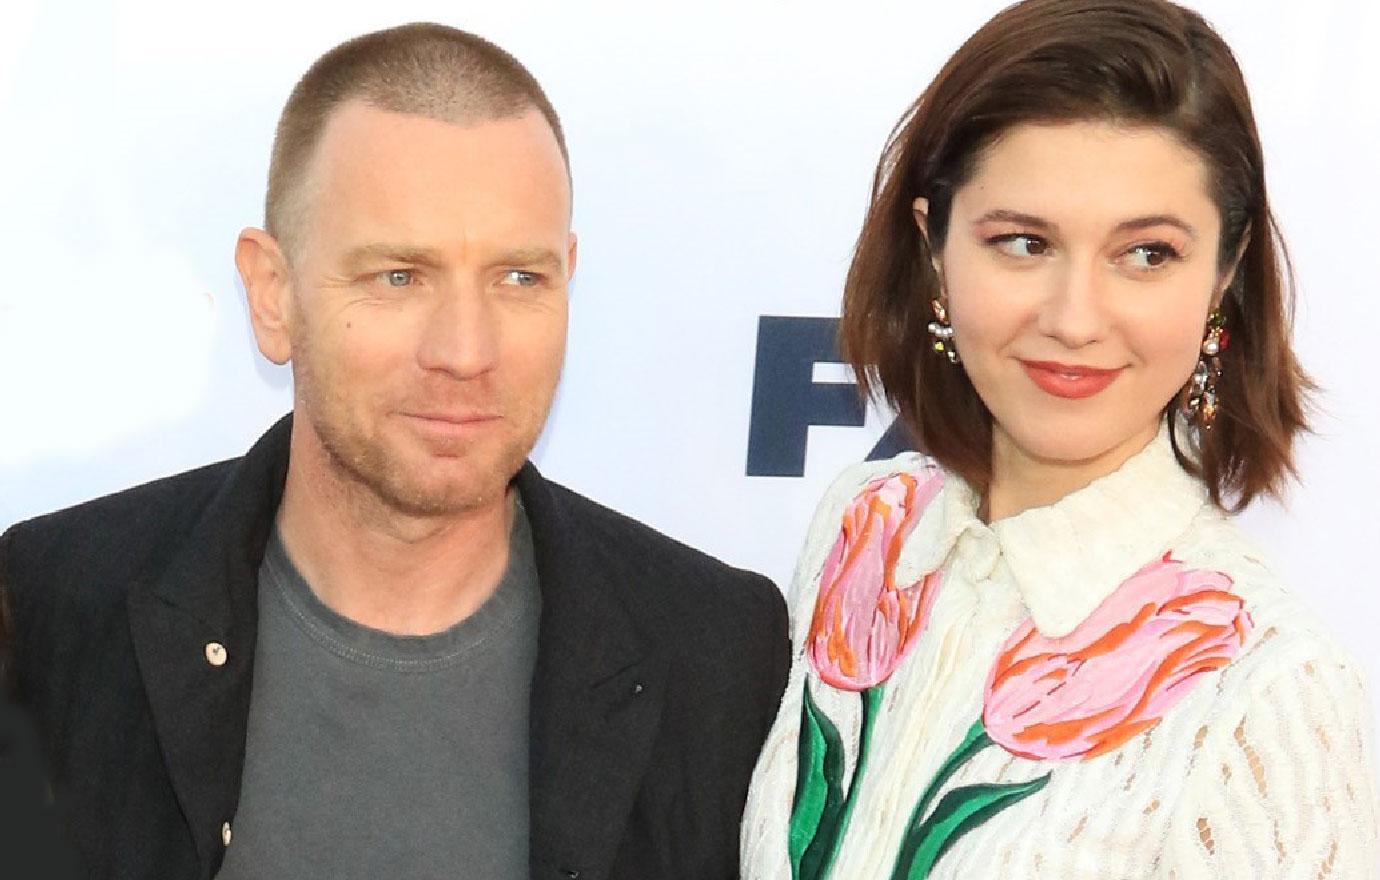 Ewan McGregor Wife Eve Mavrakis Unaware Mary Elizabeth Winstead Split